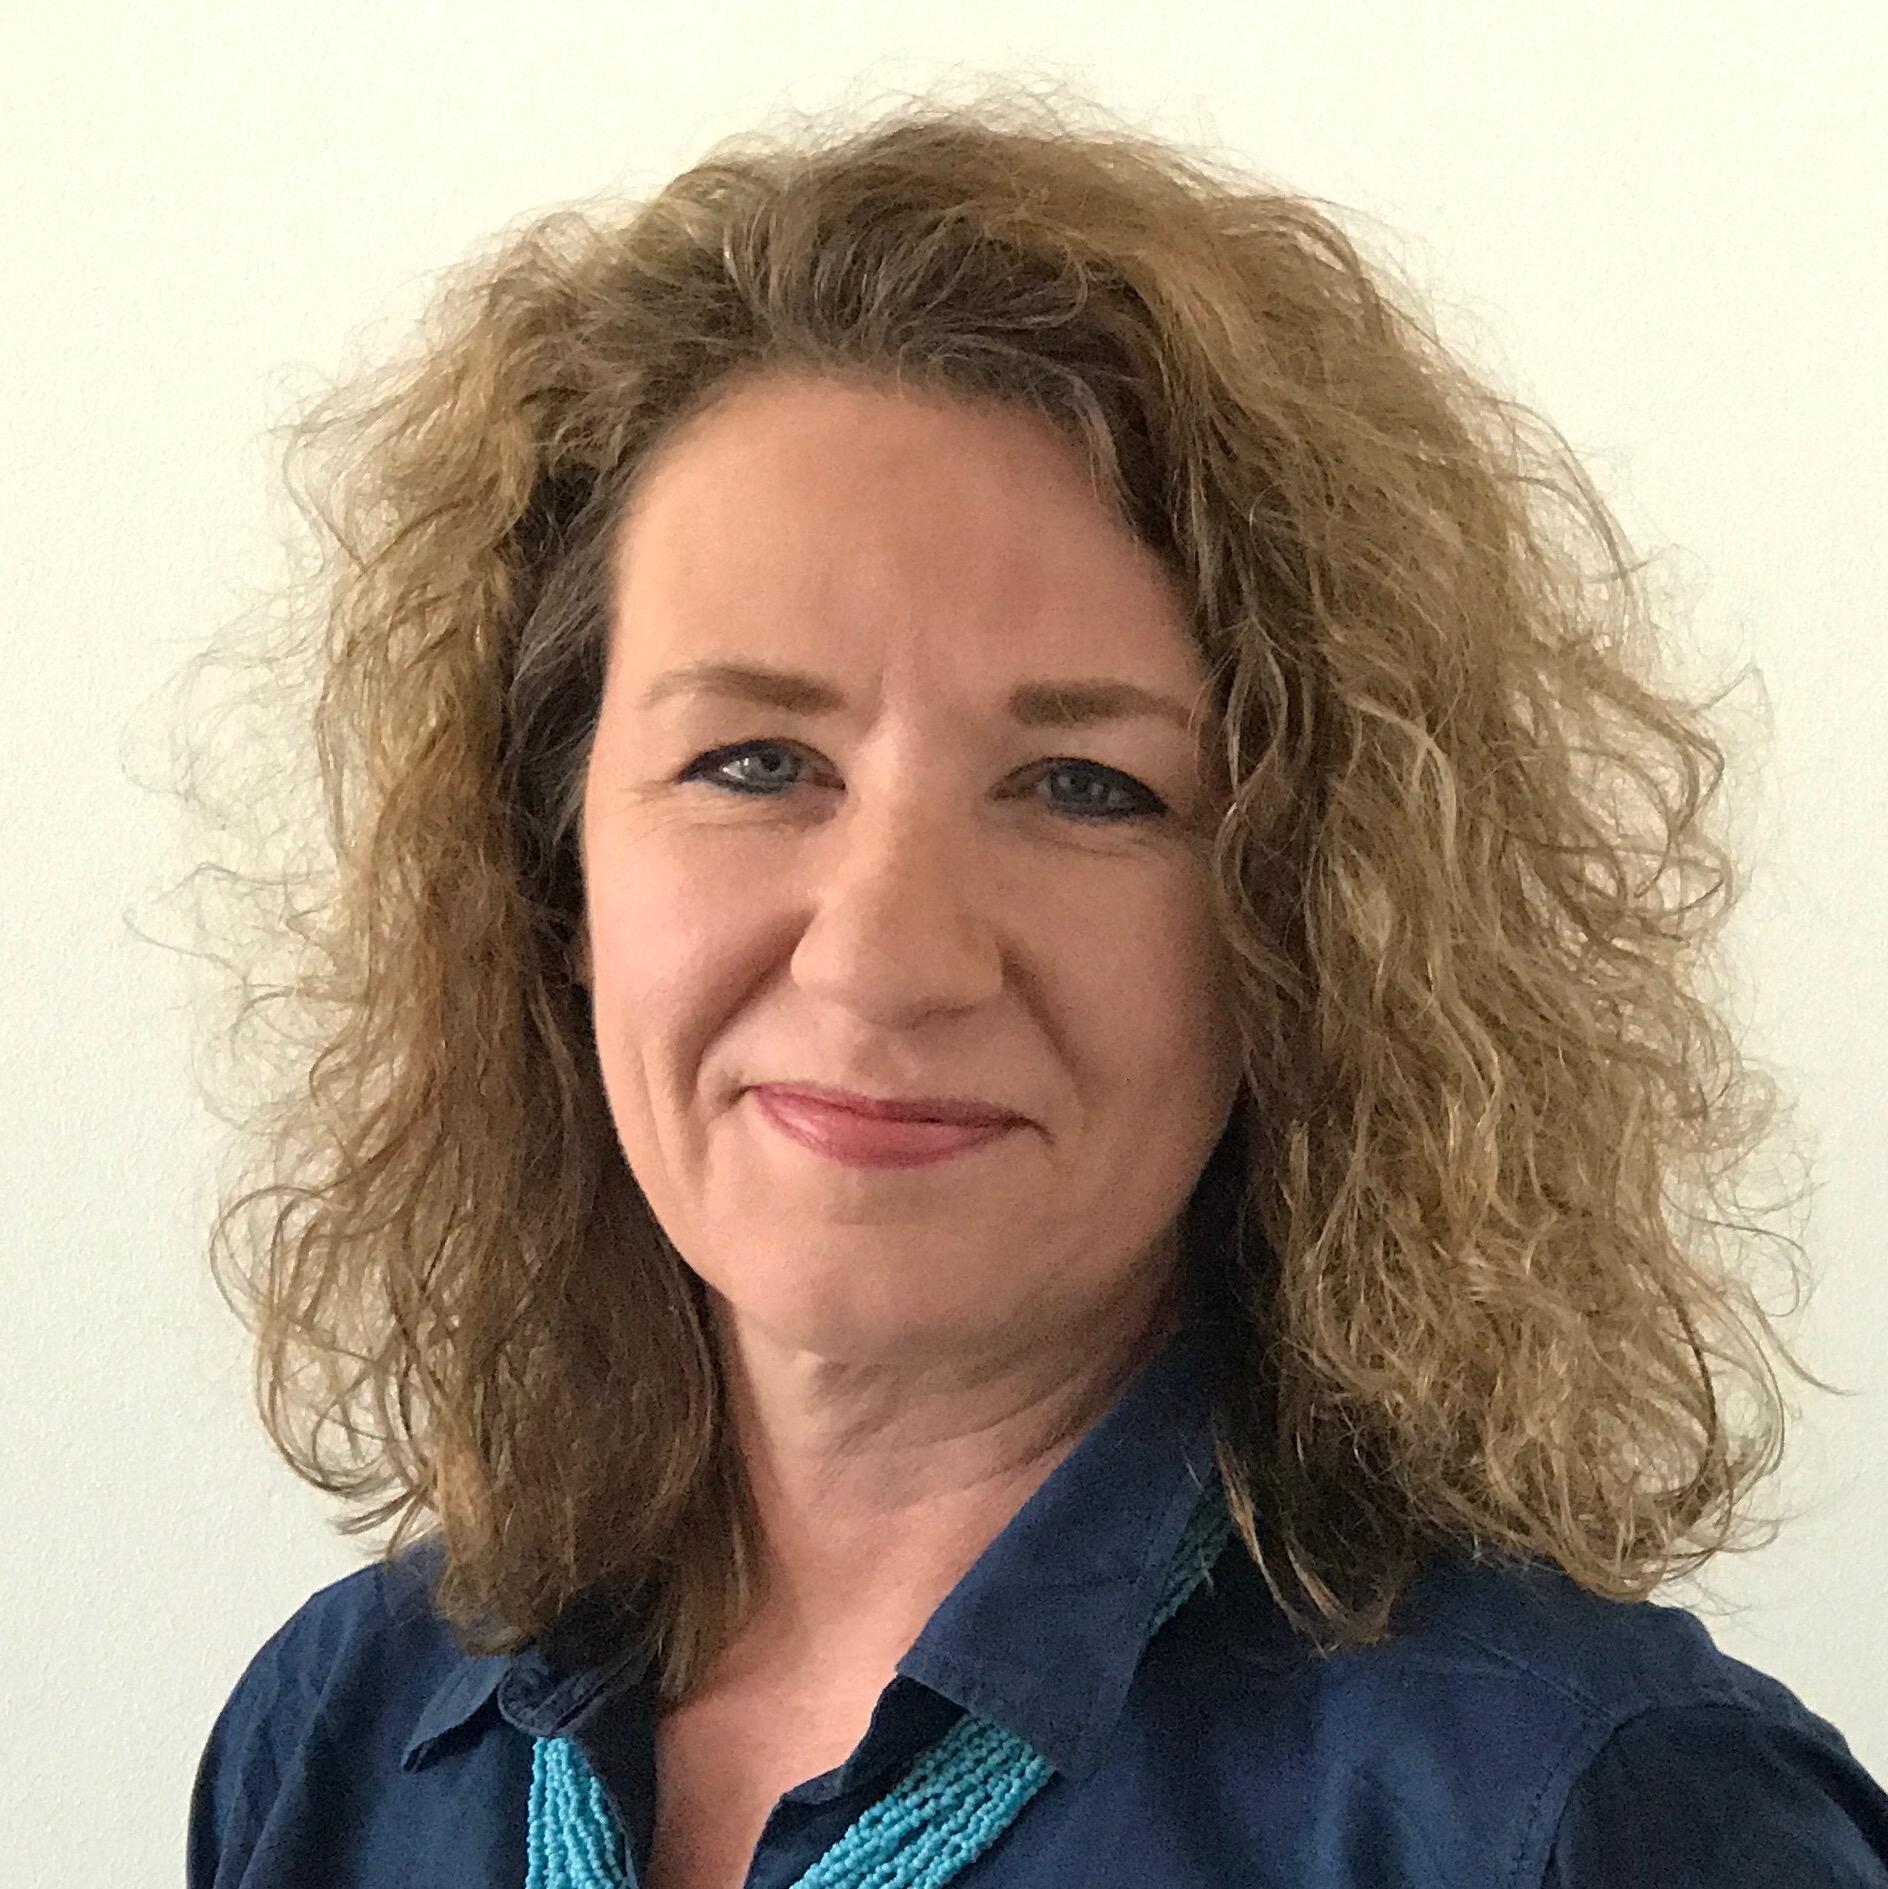 Barbara Stelzner